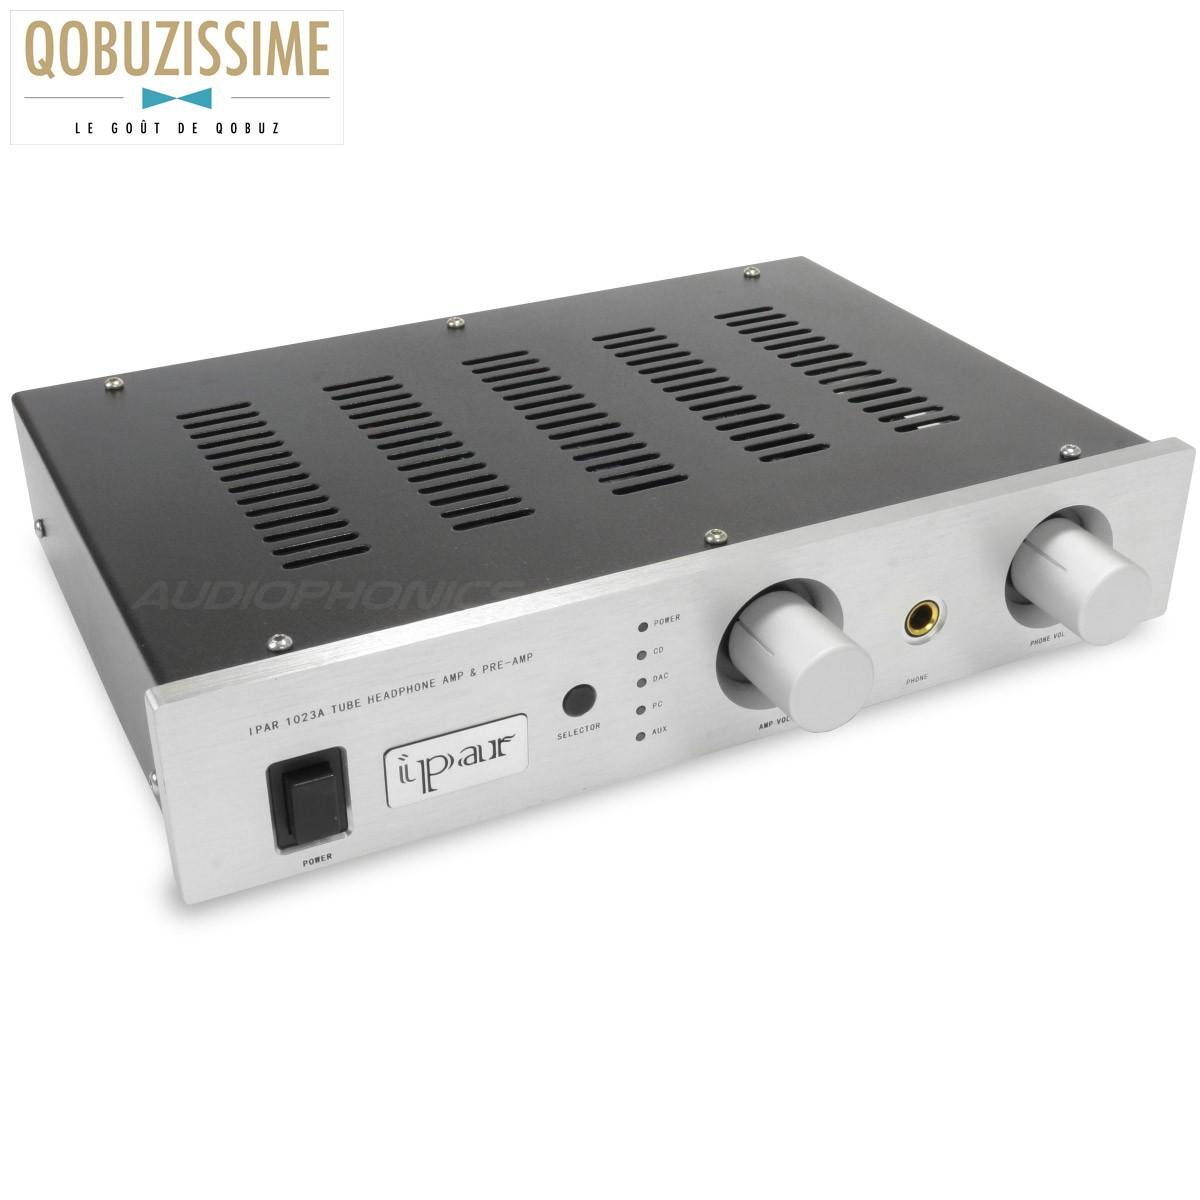 IPAR 1023A Preamplifier / Volume Controller / Headphone Amplifier / Source Selector